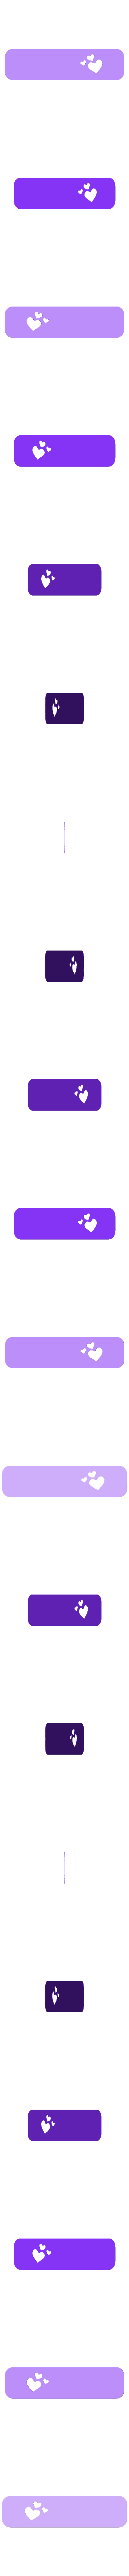 JG_bookmark_hearts.stl Download free STL file Bookmark - Hearts - Mama / Mom • 3D printable model, c47